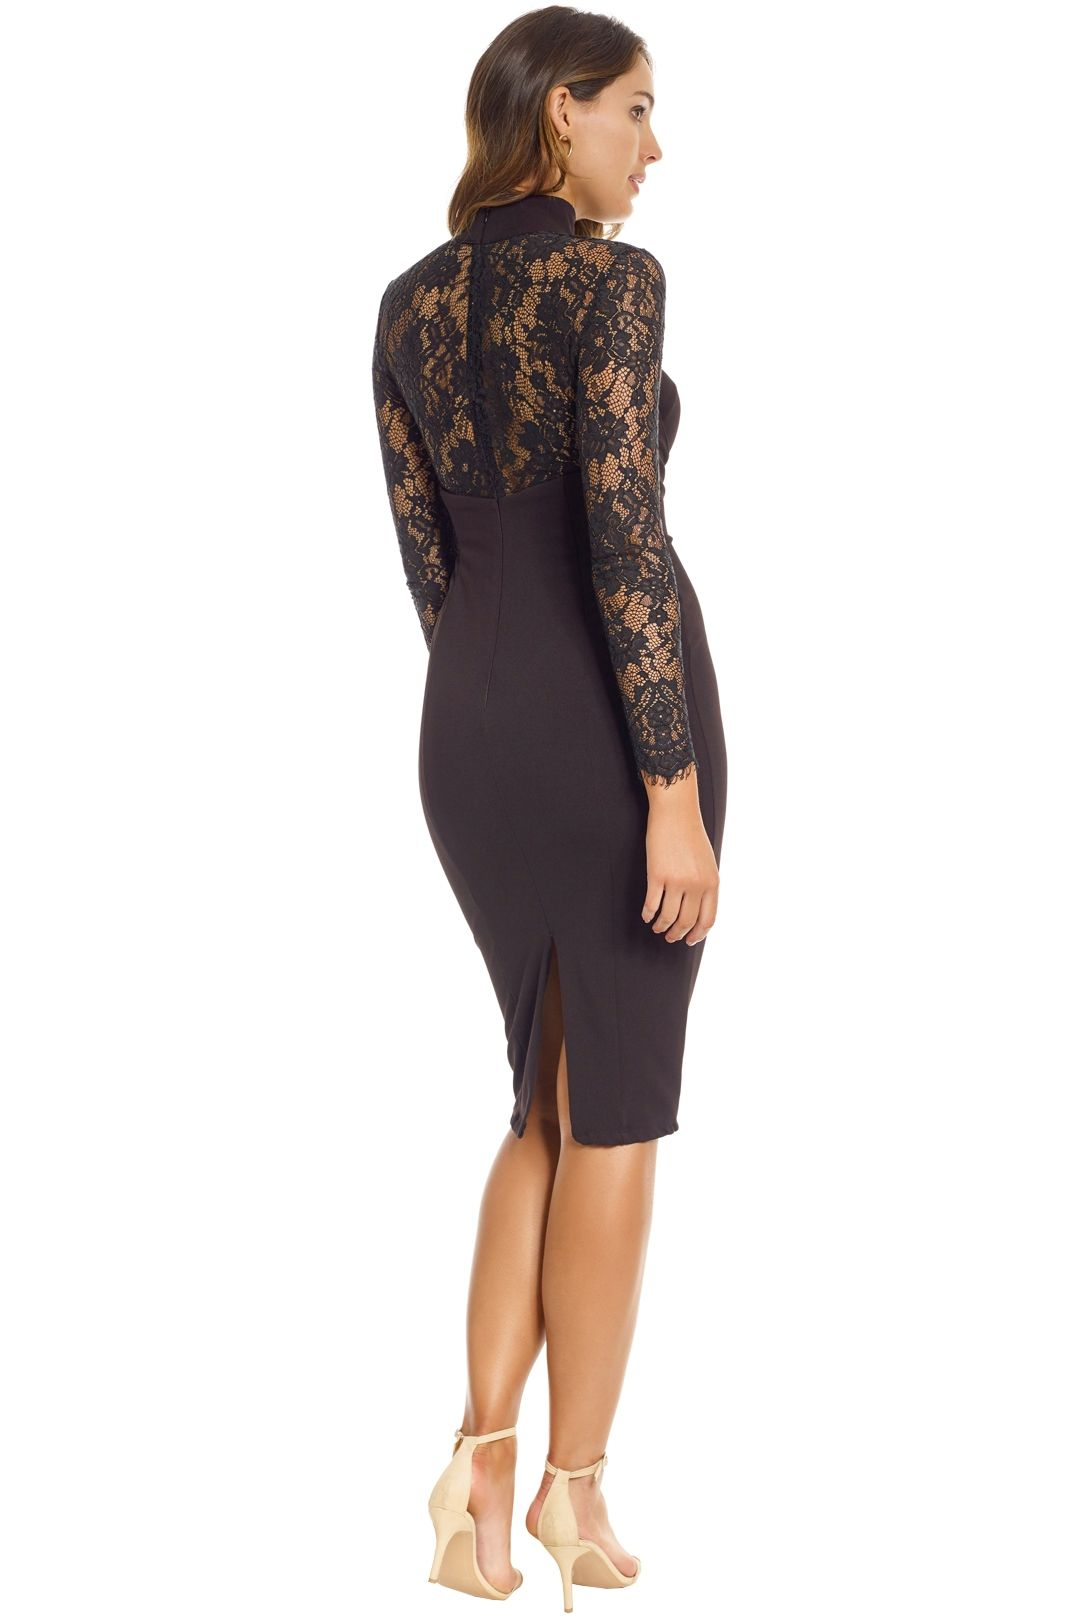 Misha Collection - Carolena Dress - Back - Black